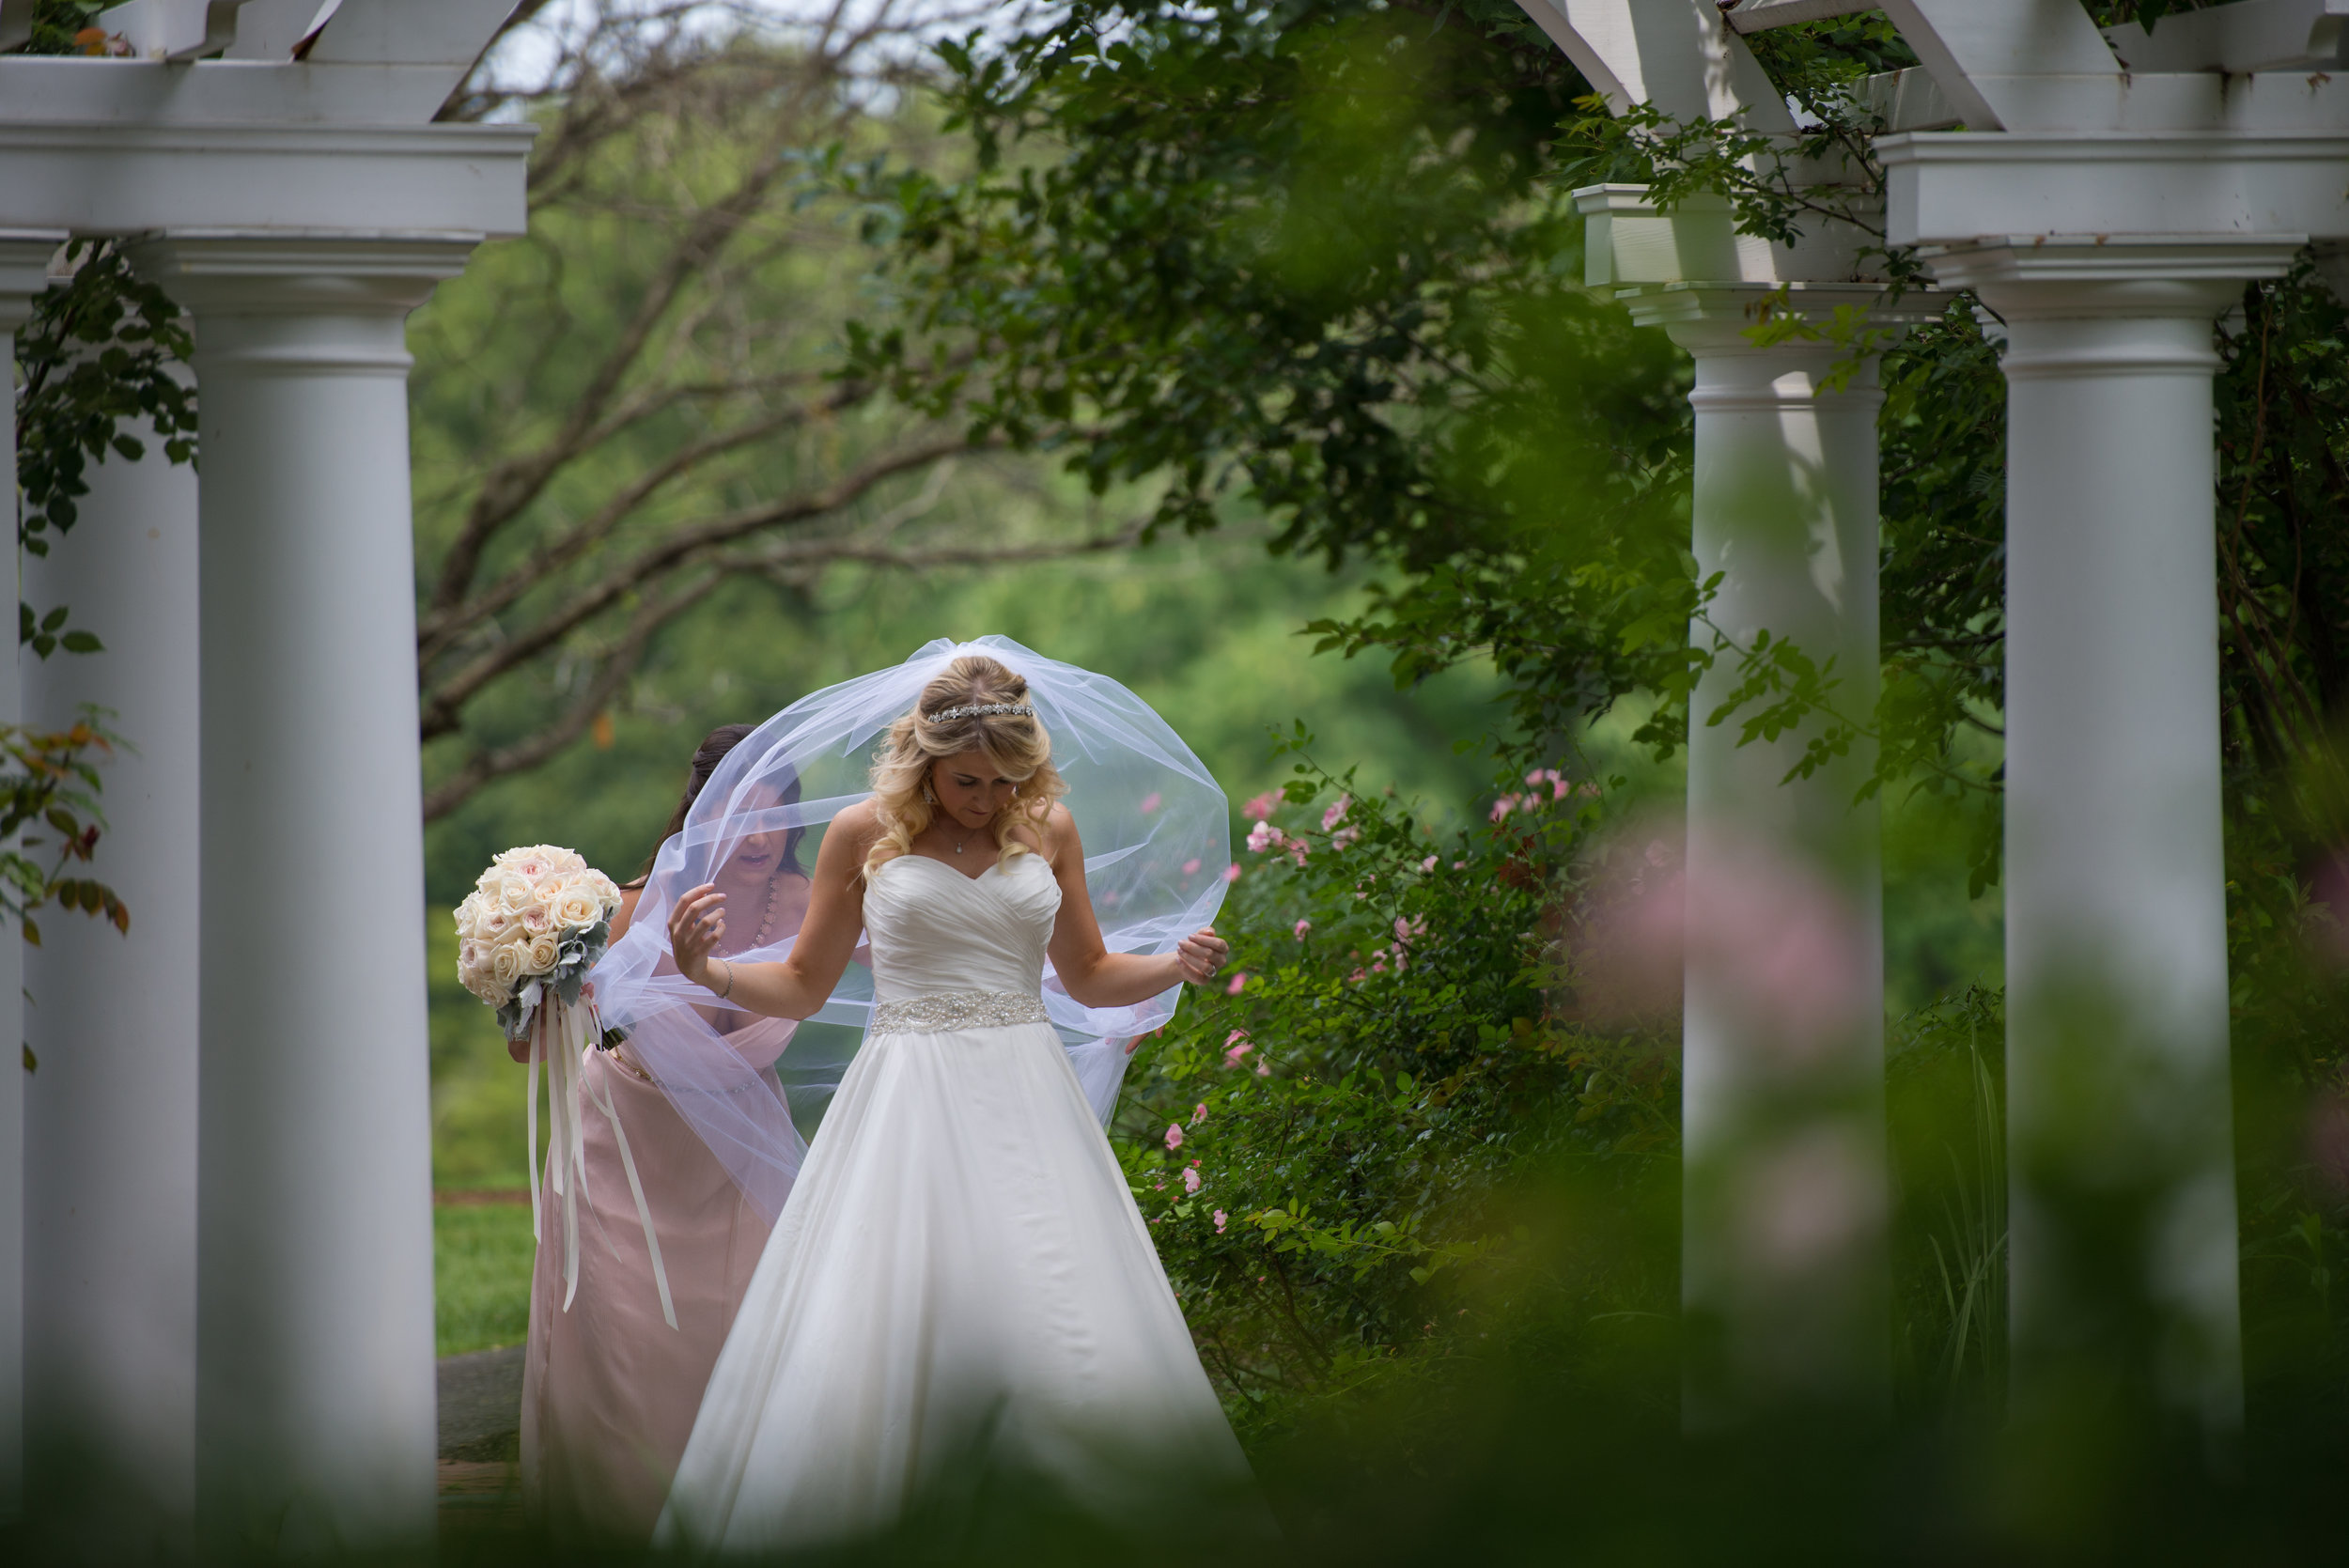 Wedding First Look Photos00906.jpg